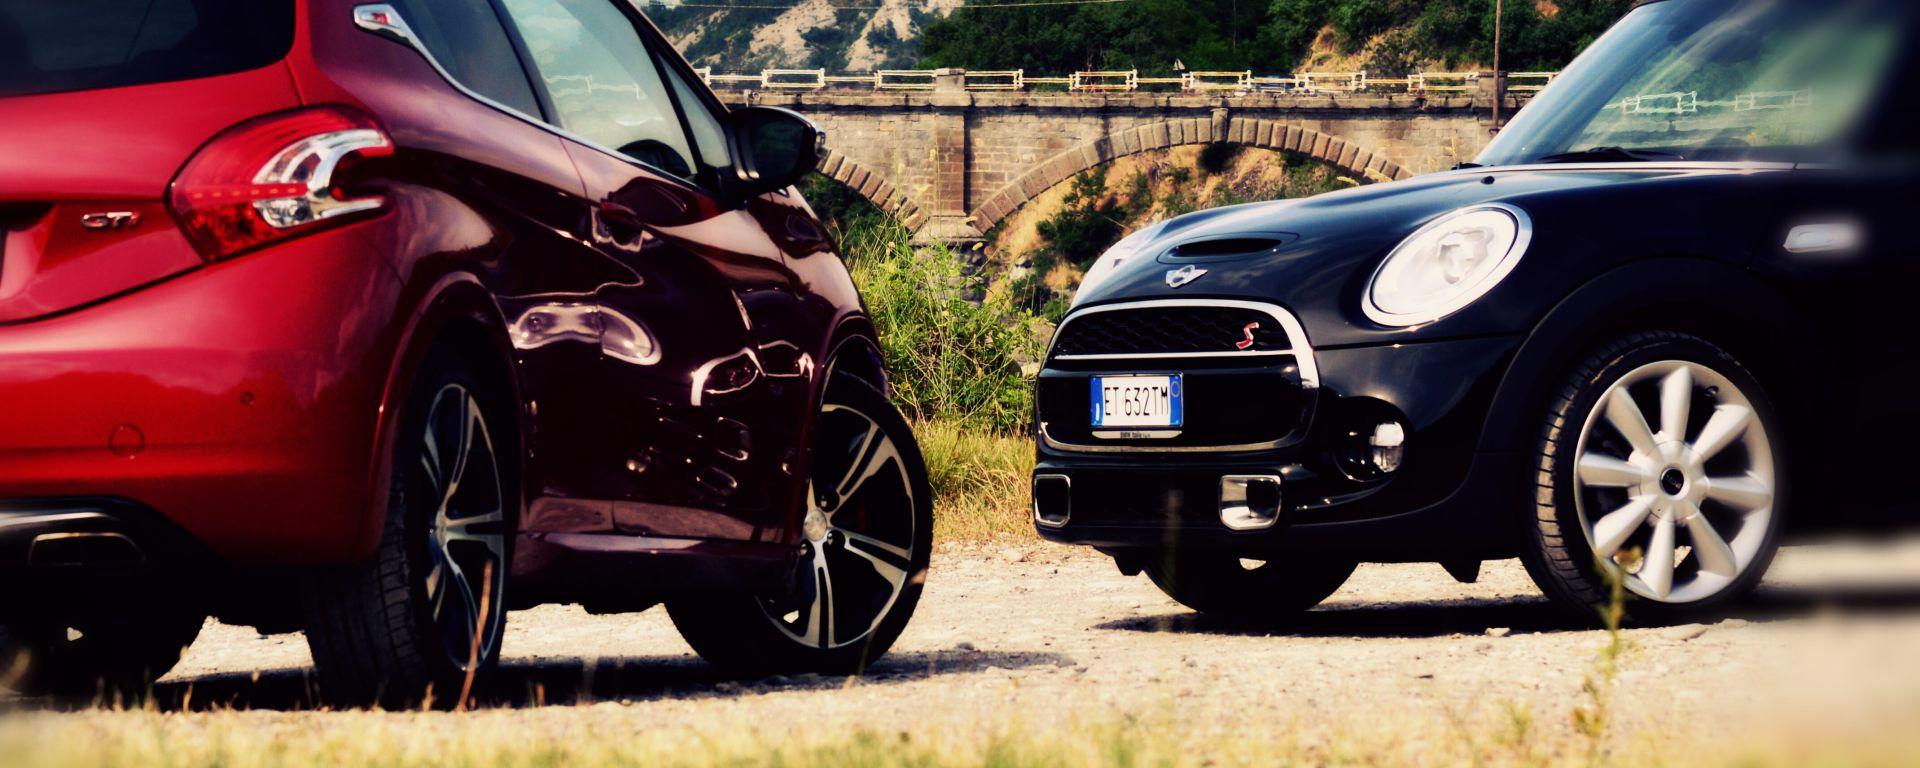 Peugeot 208 GTi vs Mini Cooper S 2014